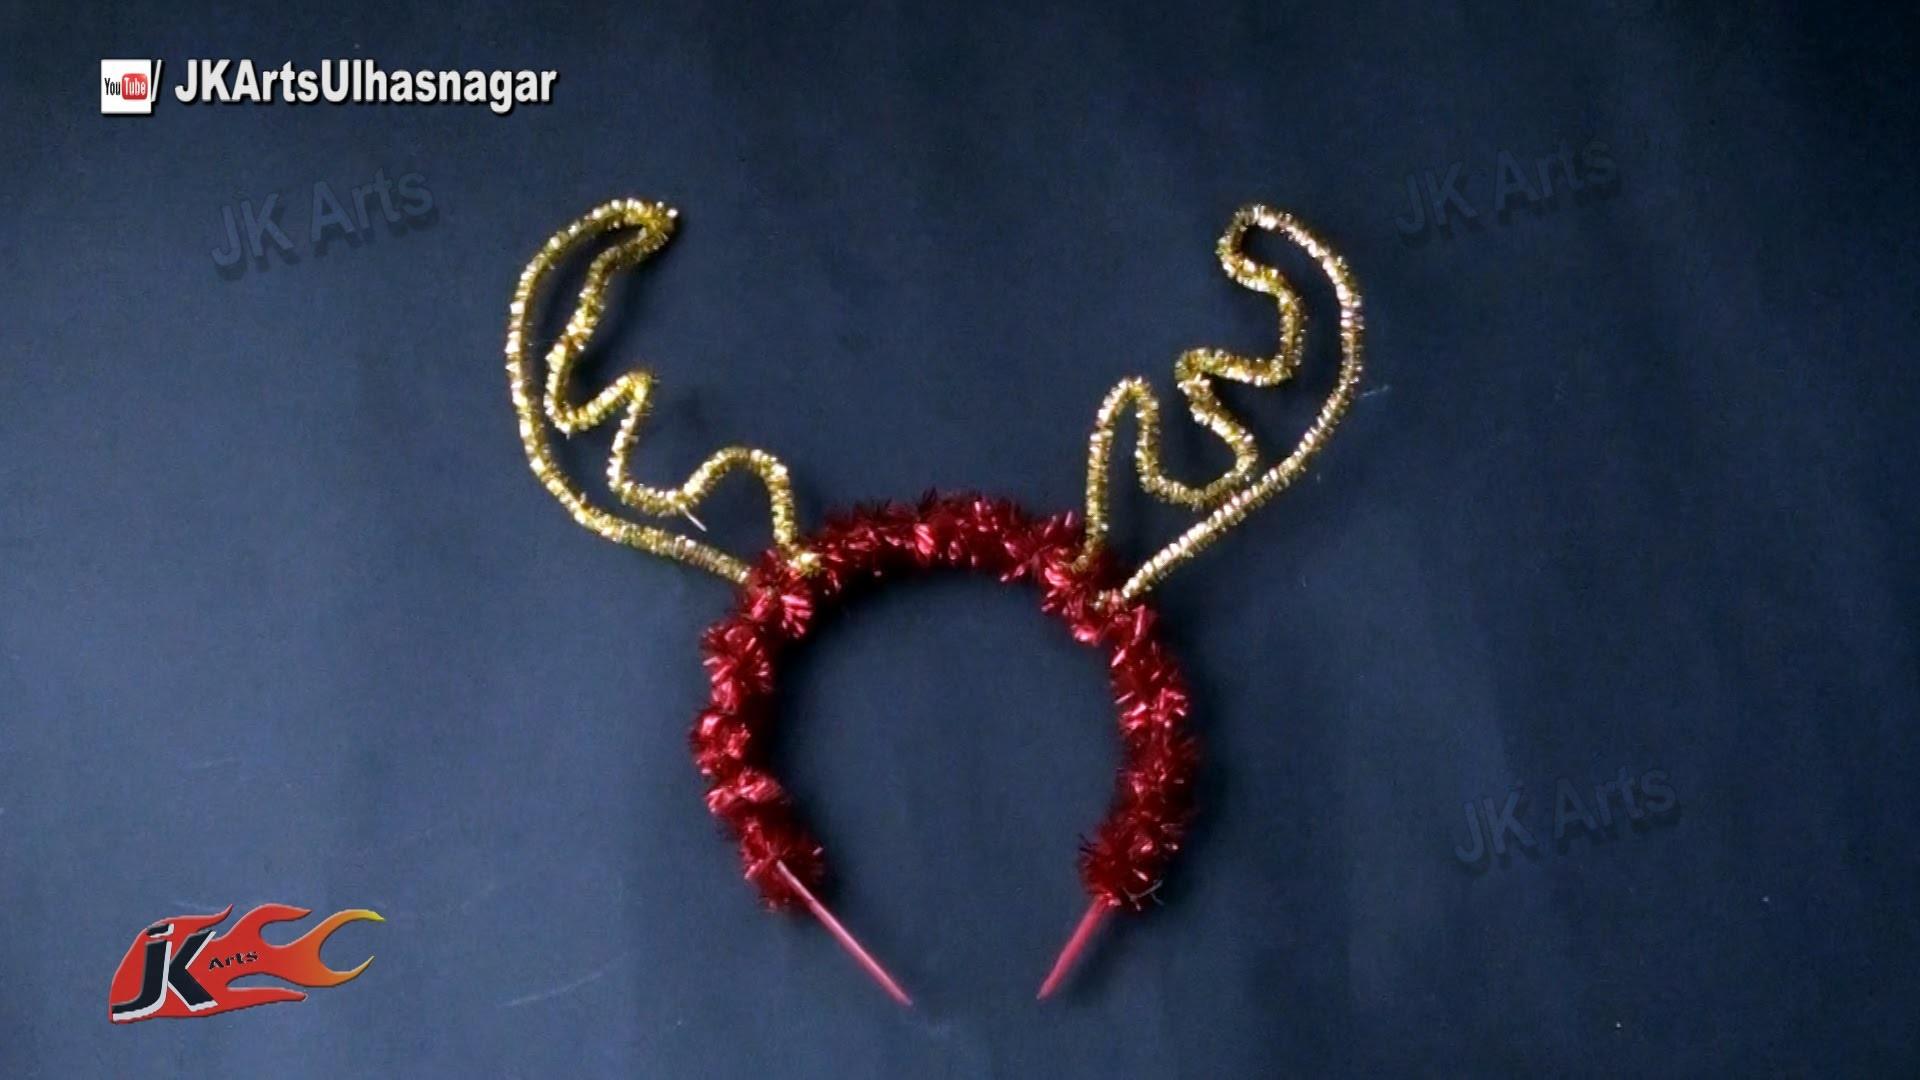 DIY Reindeer Antler Party Headbands for Christmas, New Year, Birthday | JK Arts 820